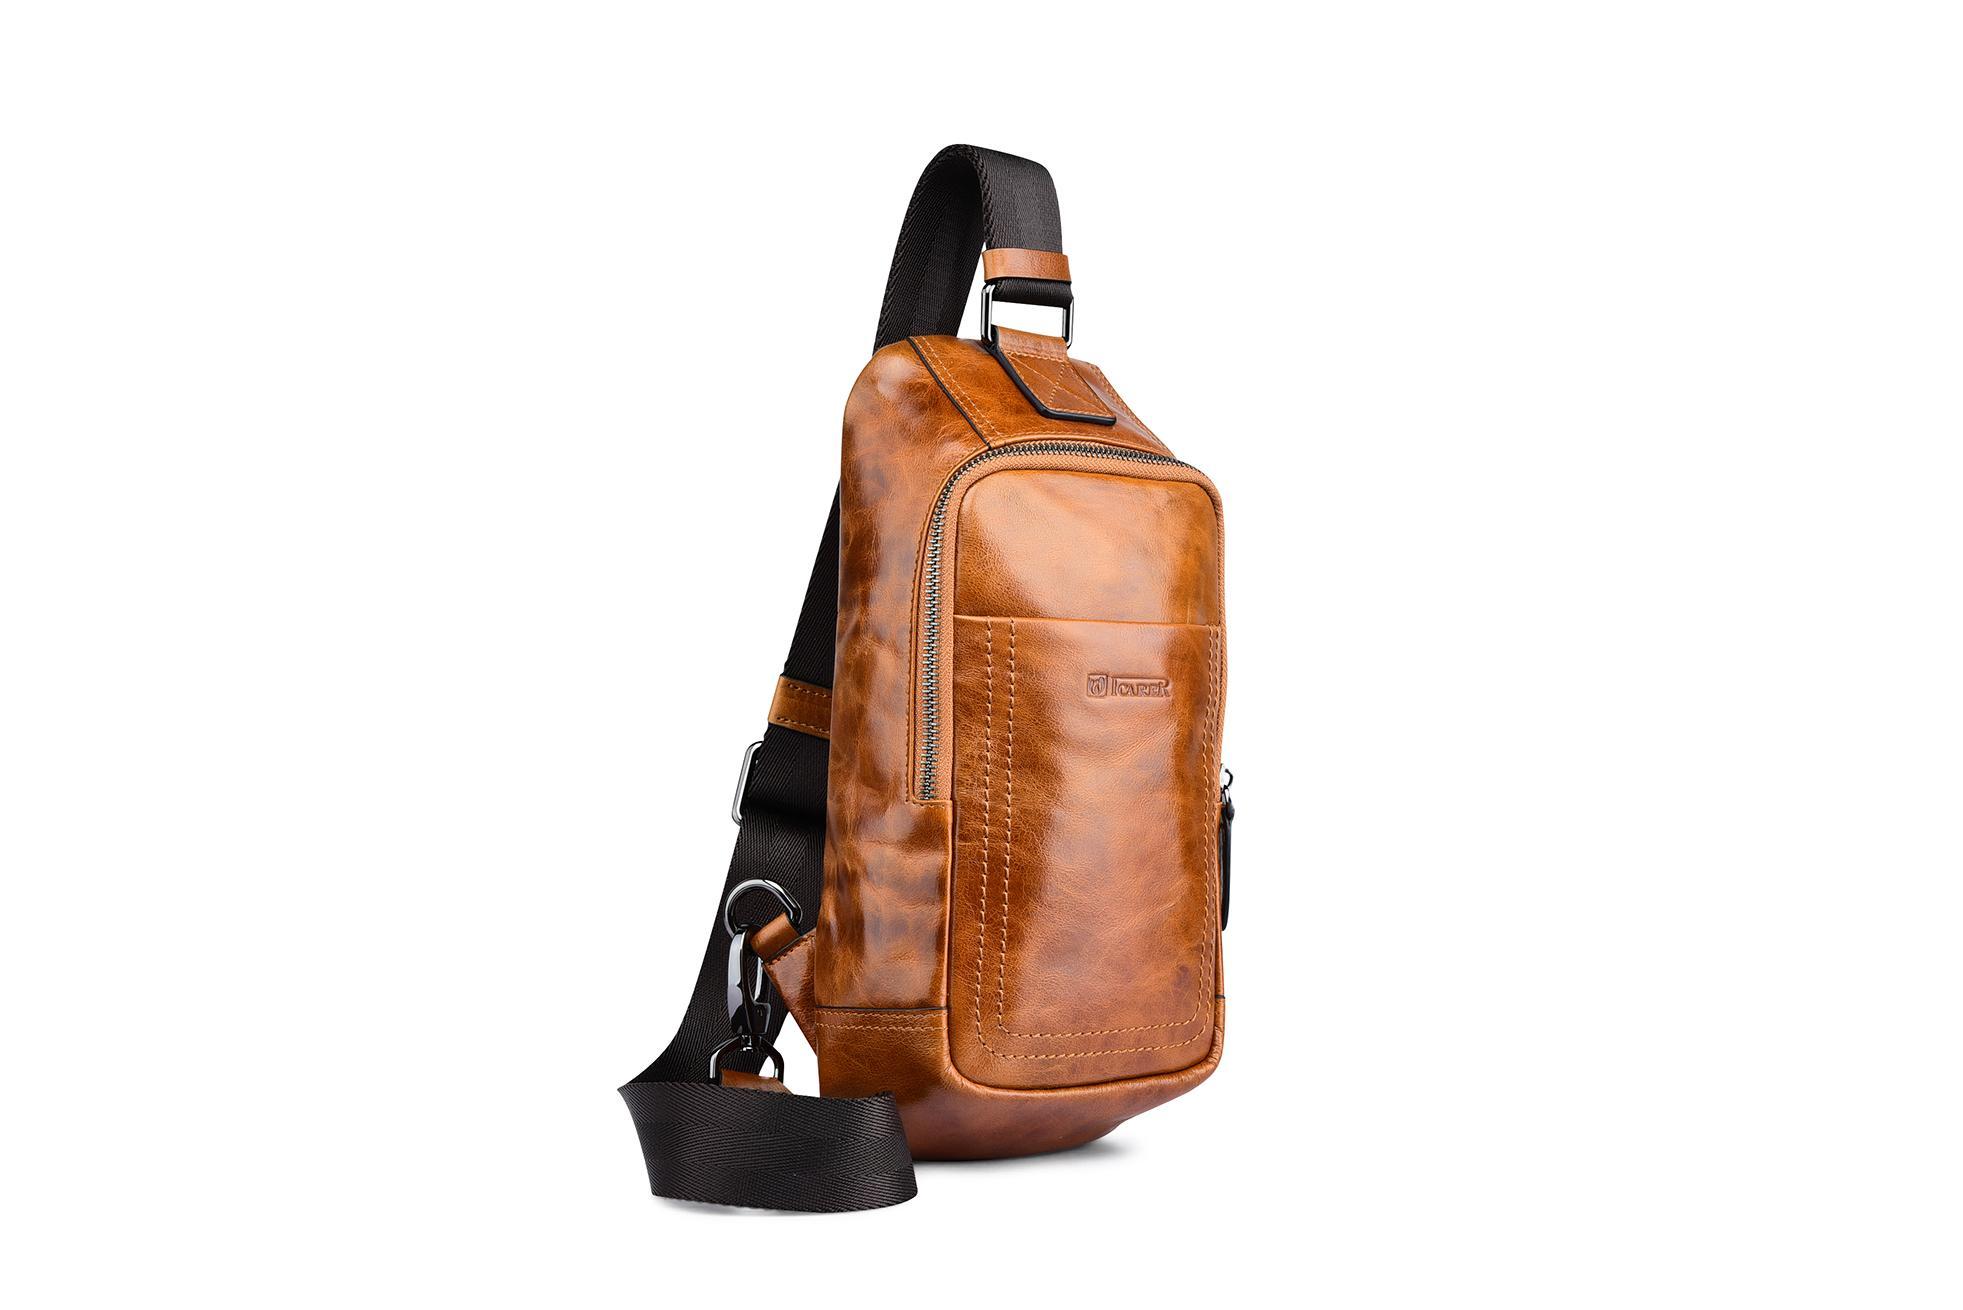 iCarer Vintage Oil Wax Real Leather Cross Body Bag 6